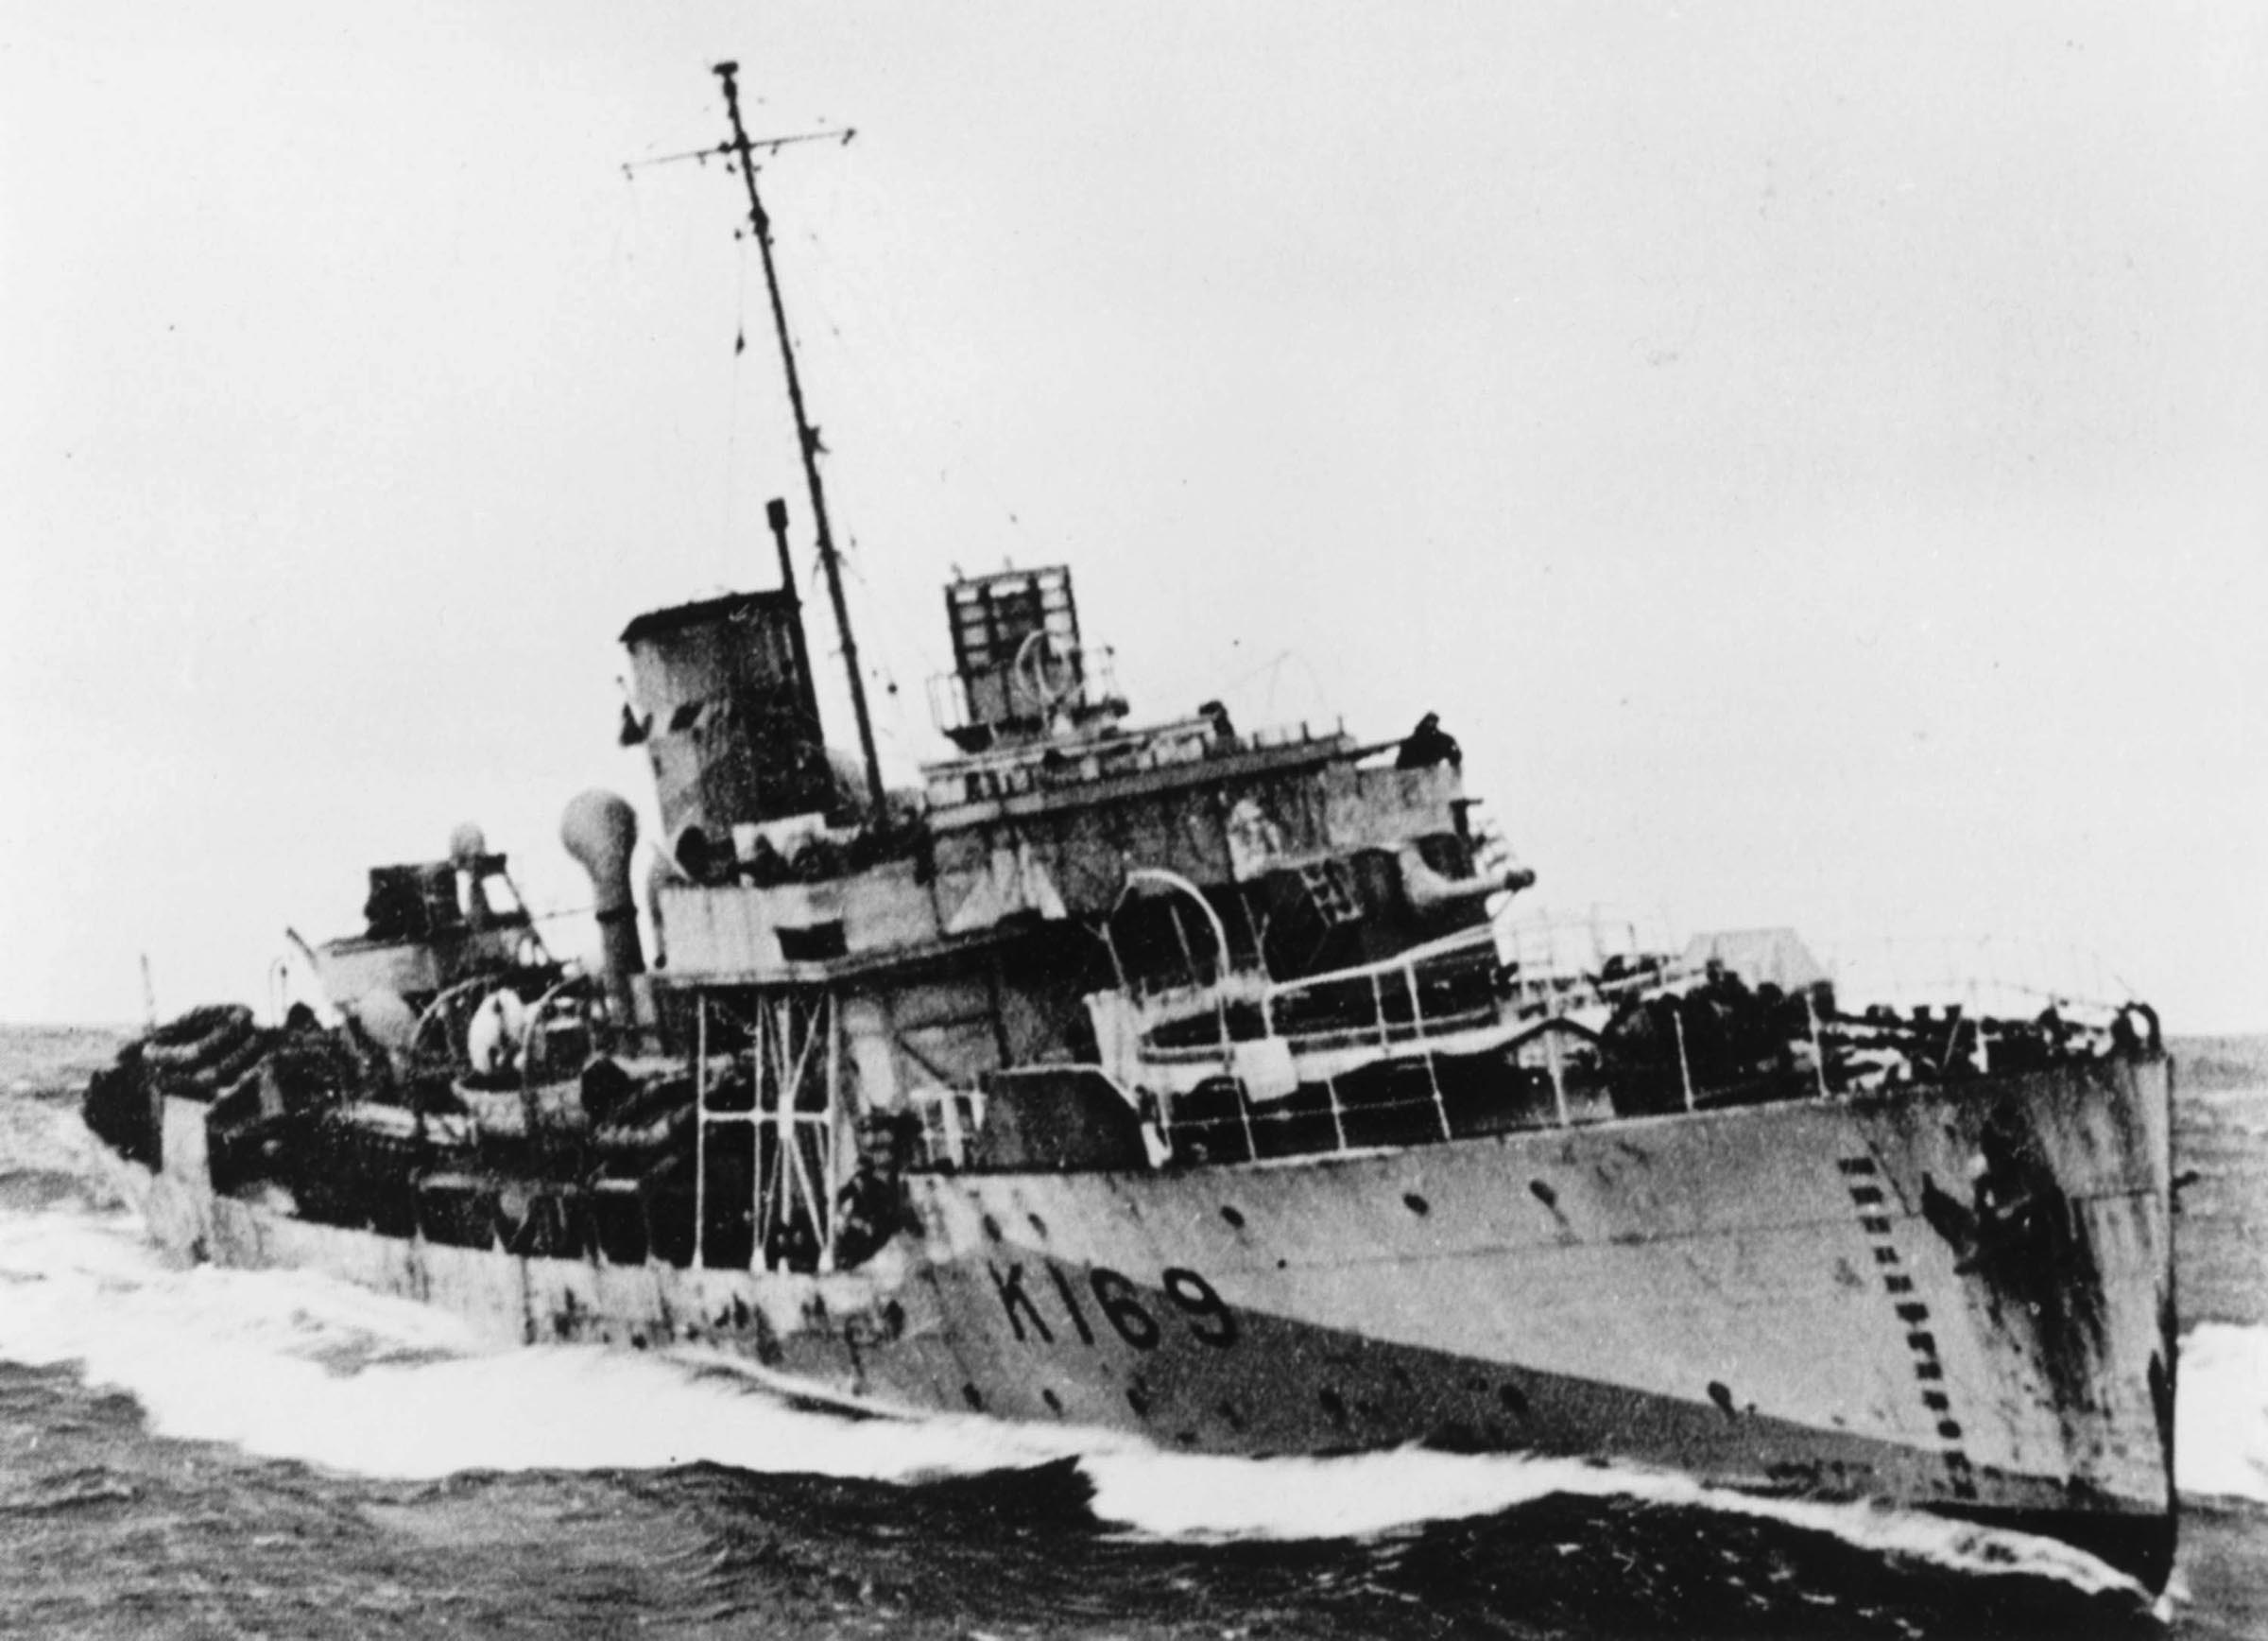 HMCS ROSTHERN